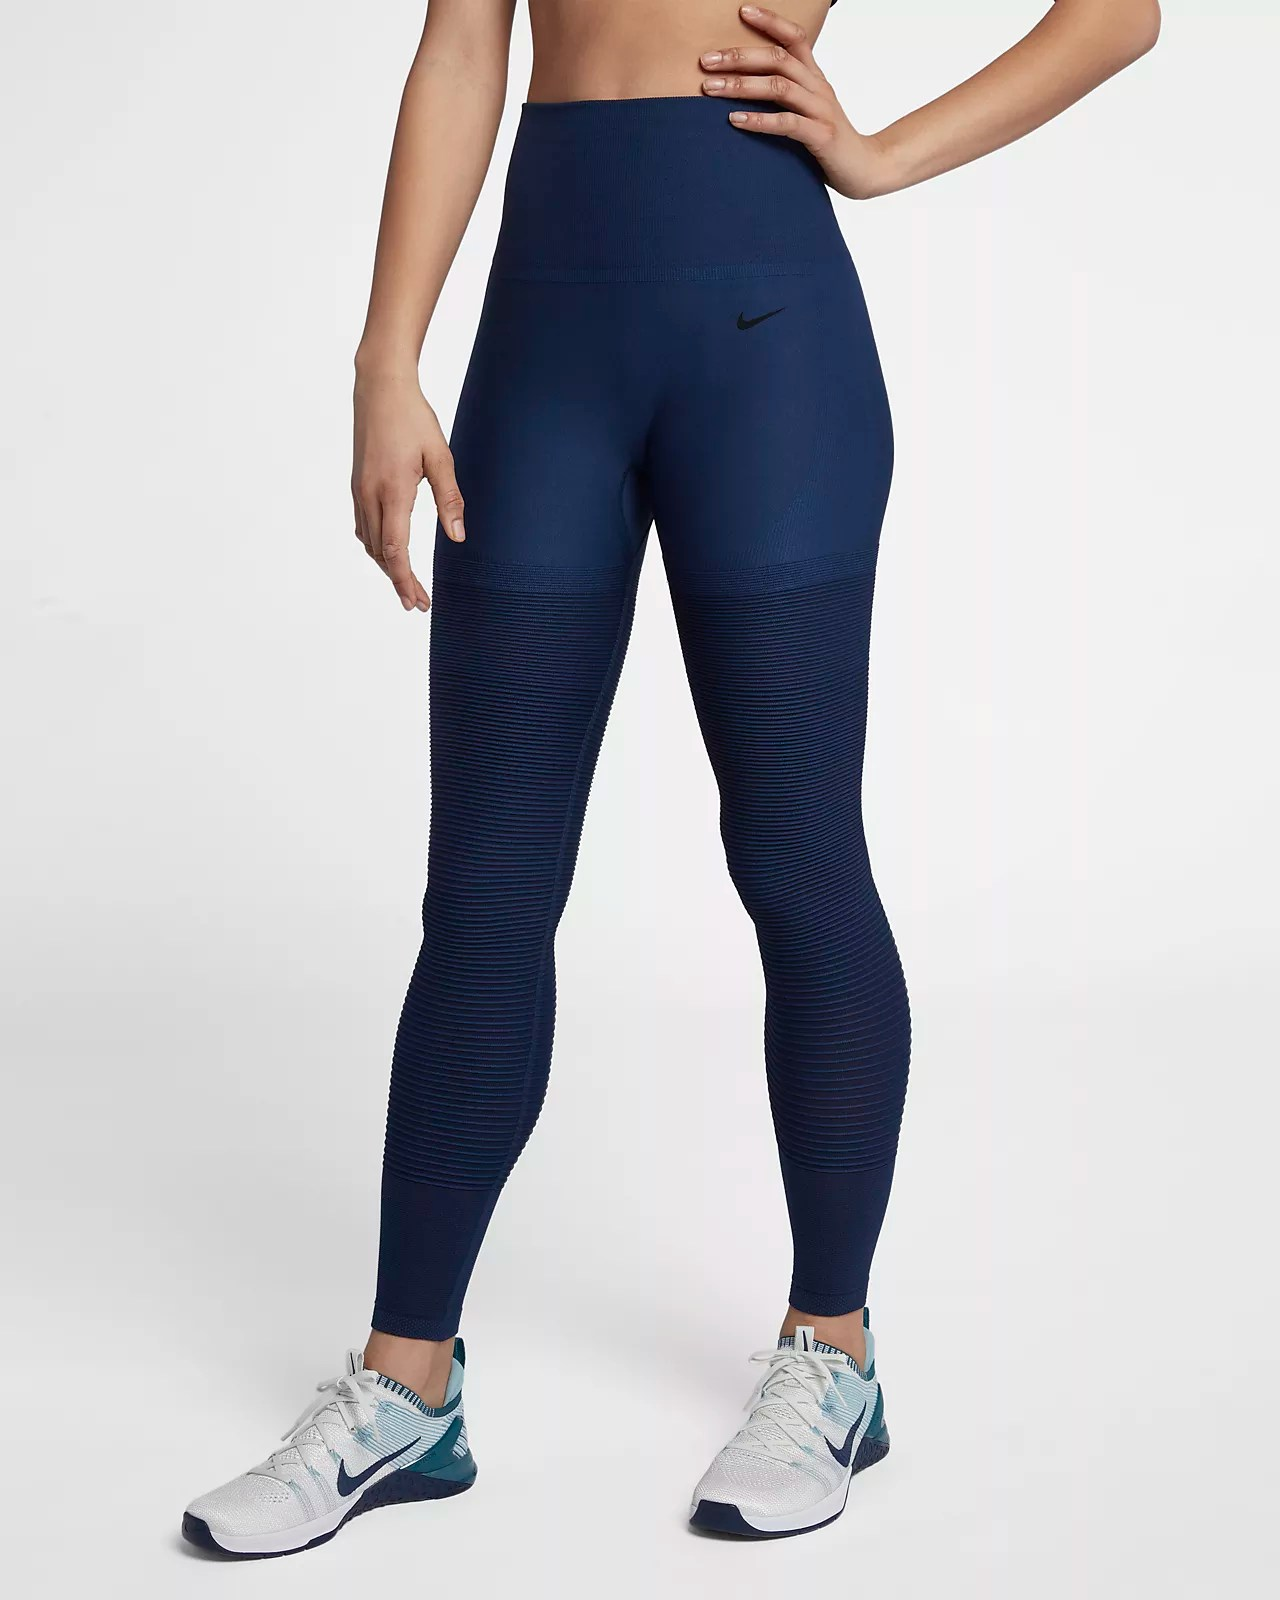 Nike Seamless 女款高腰訓練緊身褲。Nike TW